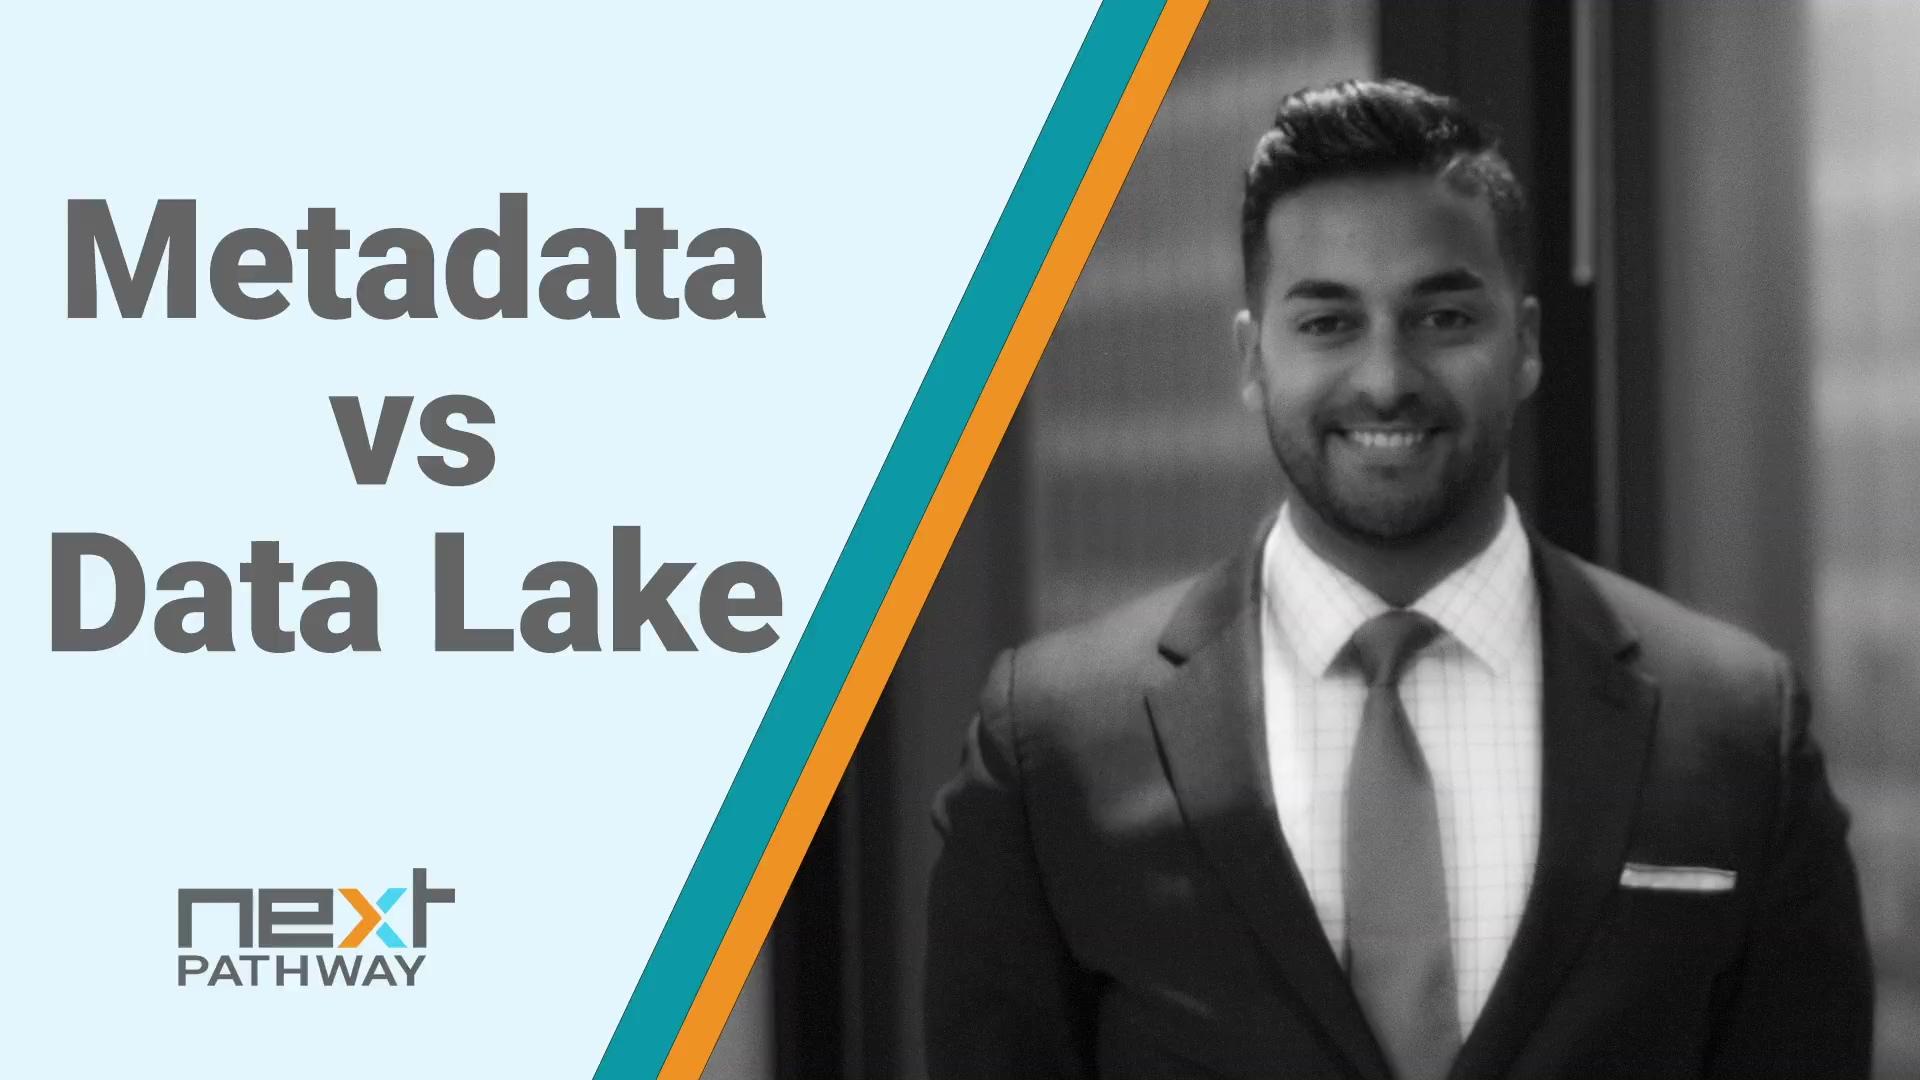 Metadata Versus Data Lake